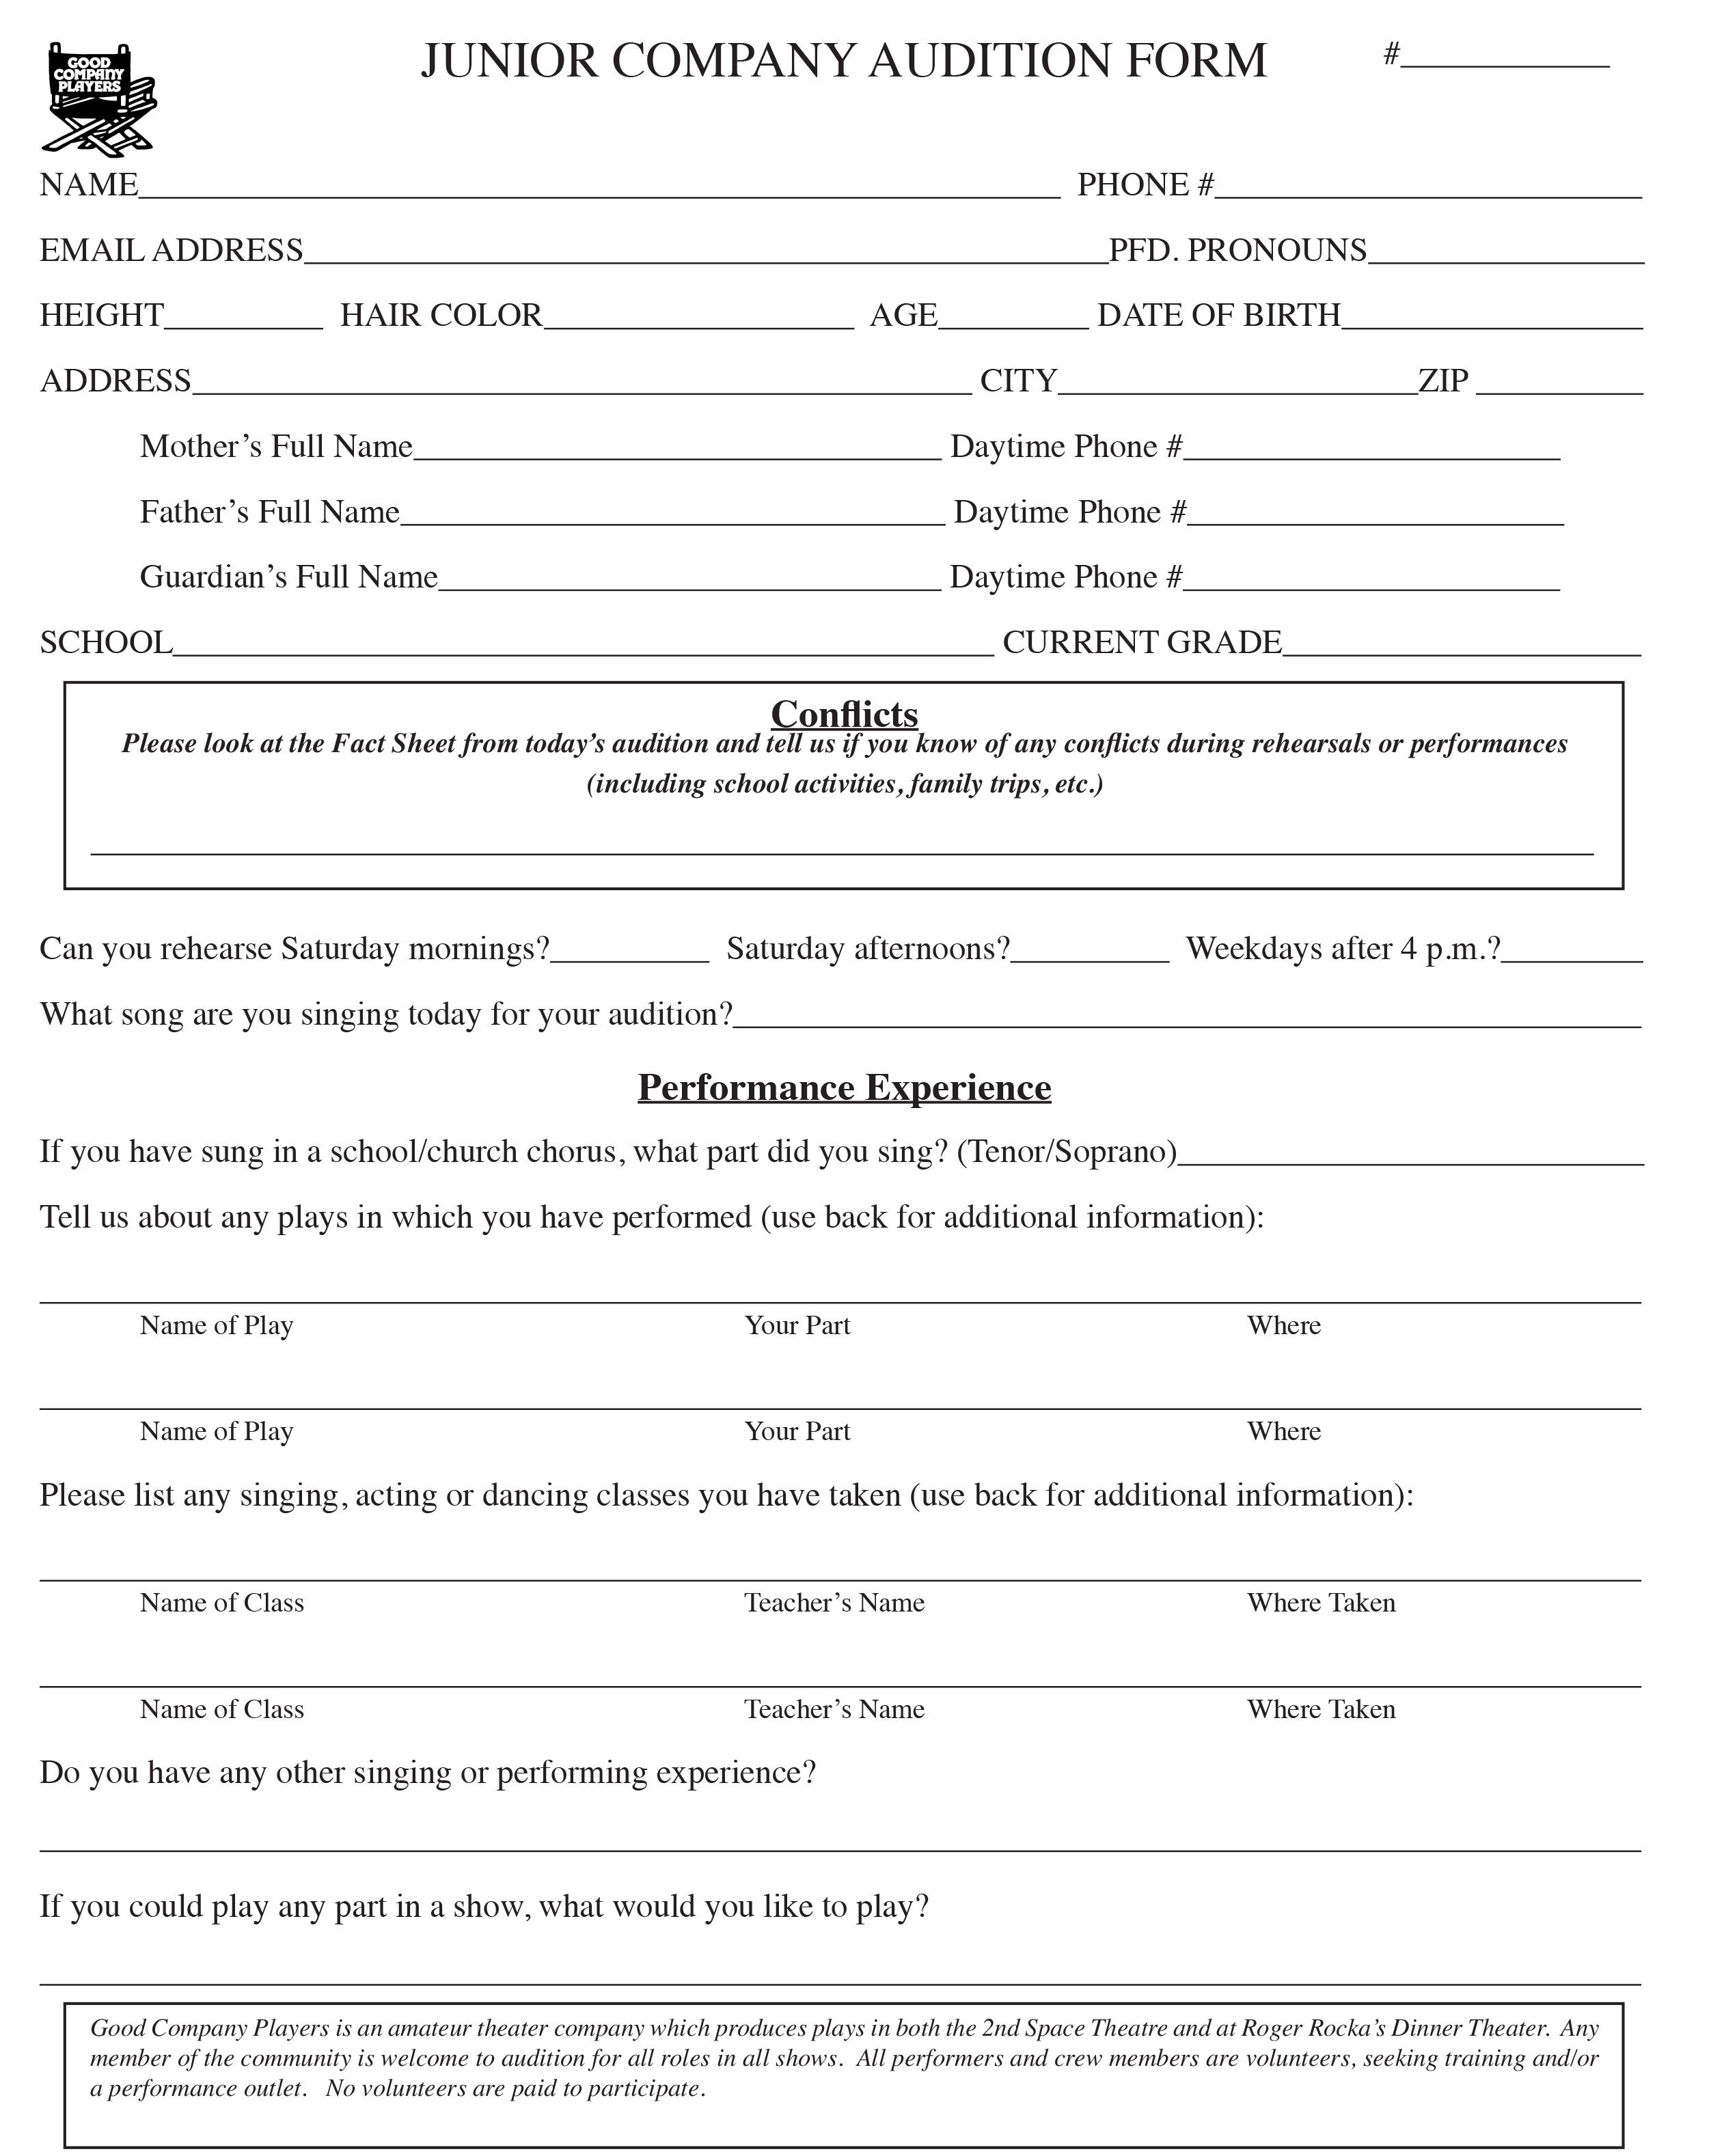 Junior Company Audition Form